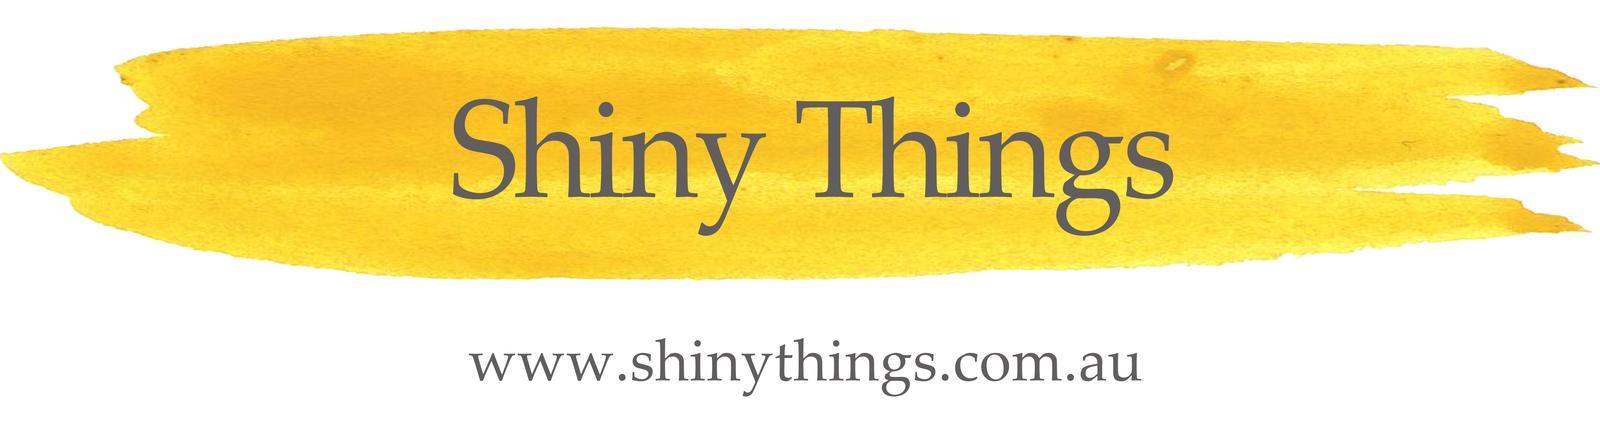 Shiny Things Logo